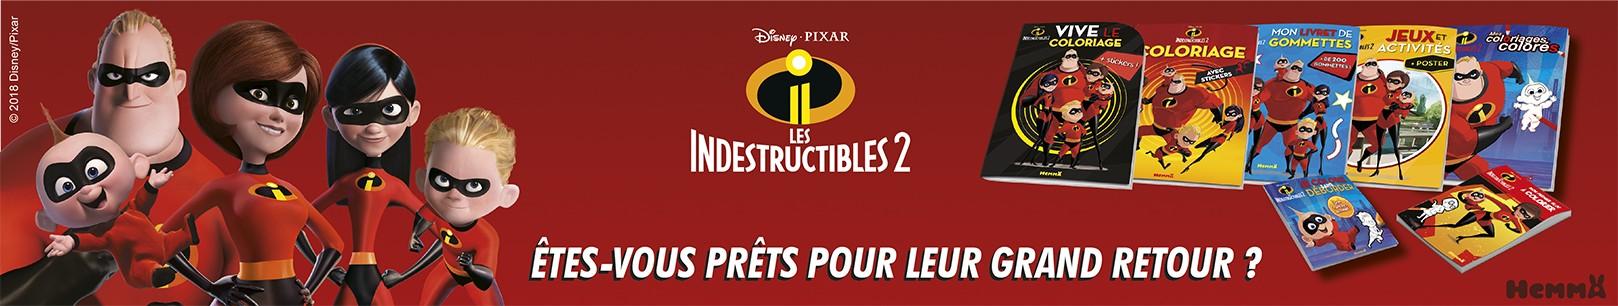 1805383 - Indestructibles